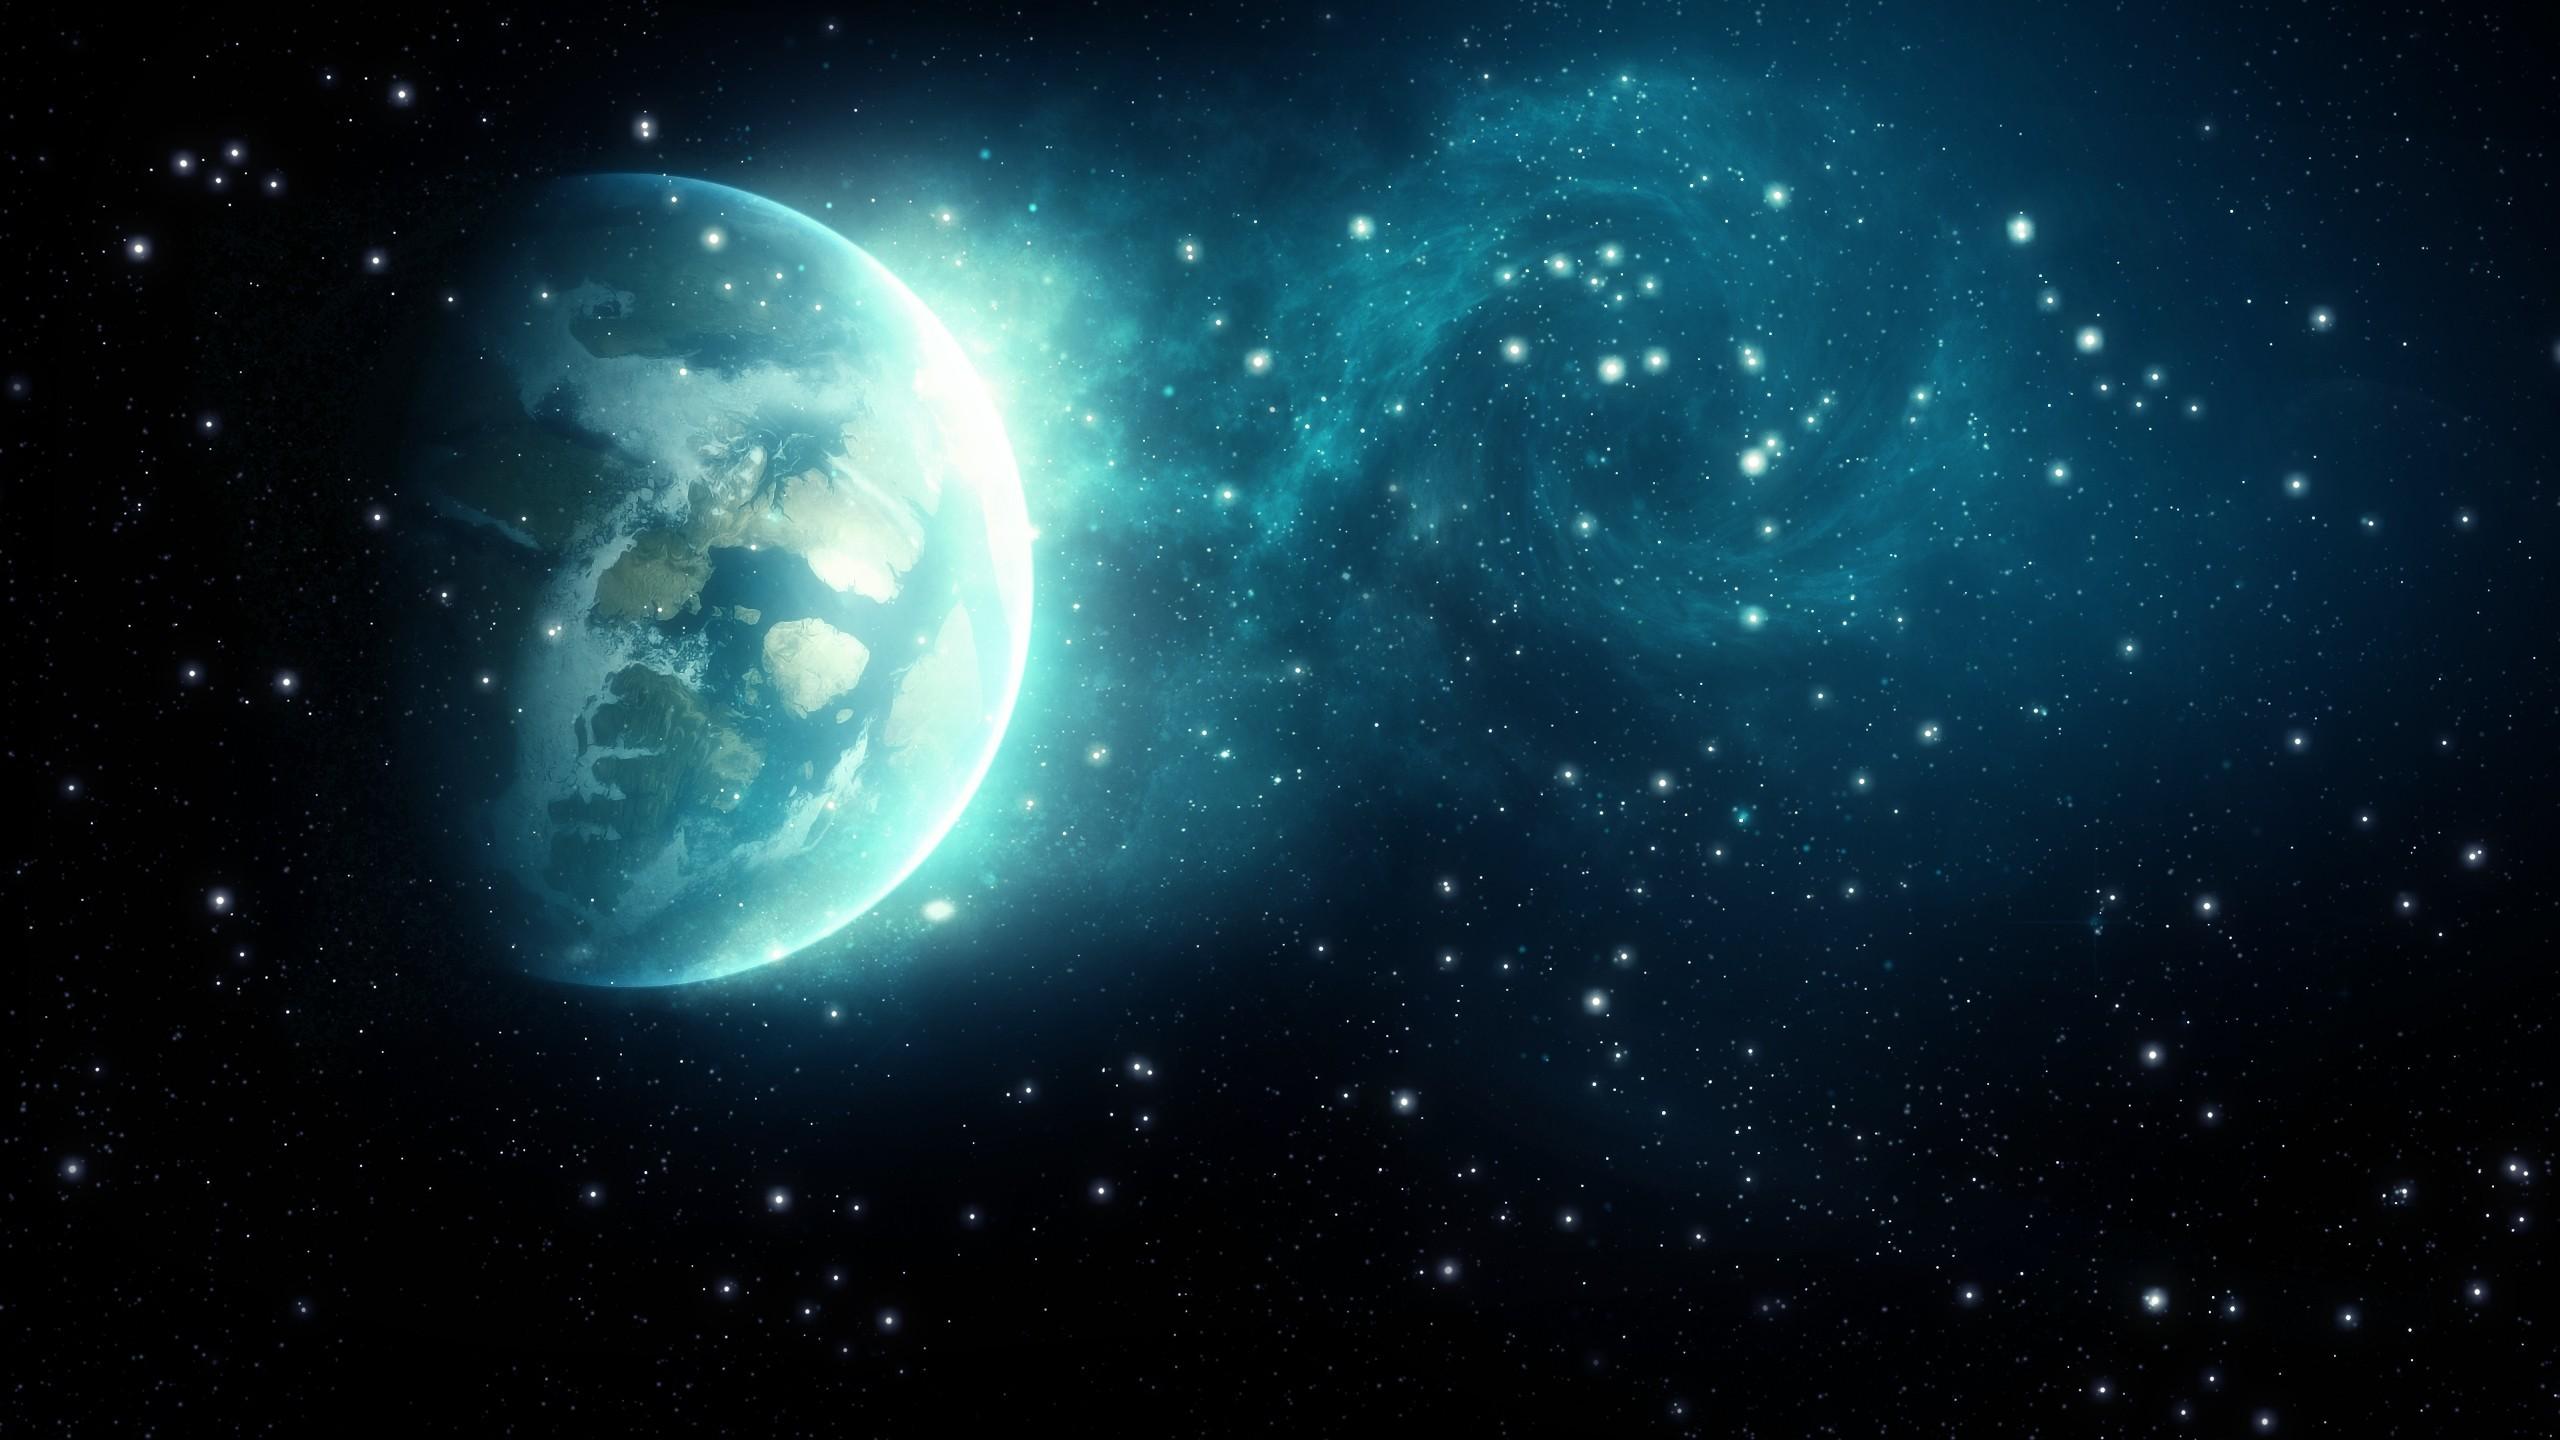 Space / Galaxy Wallpaper